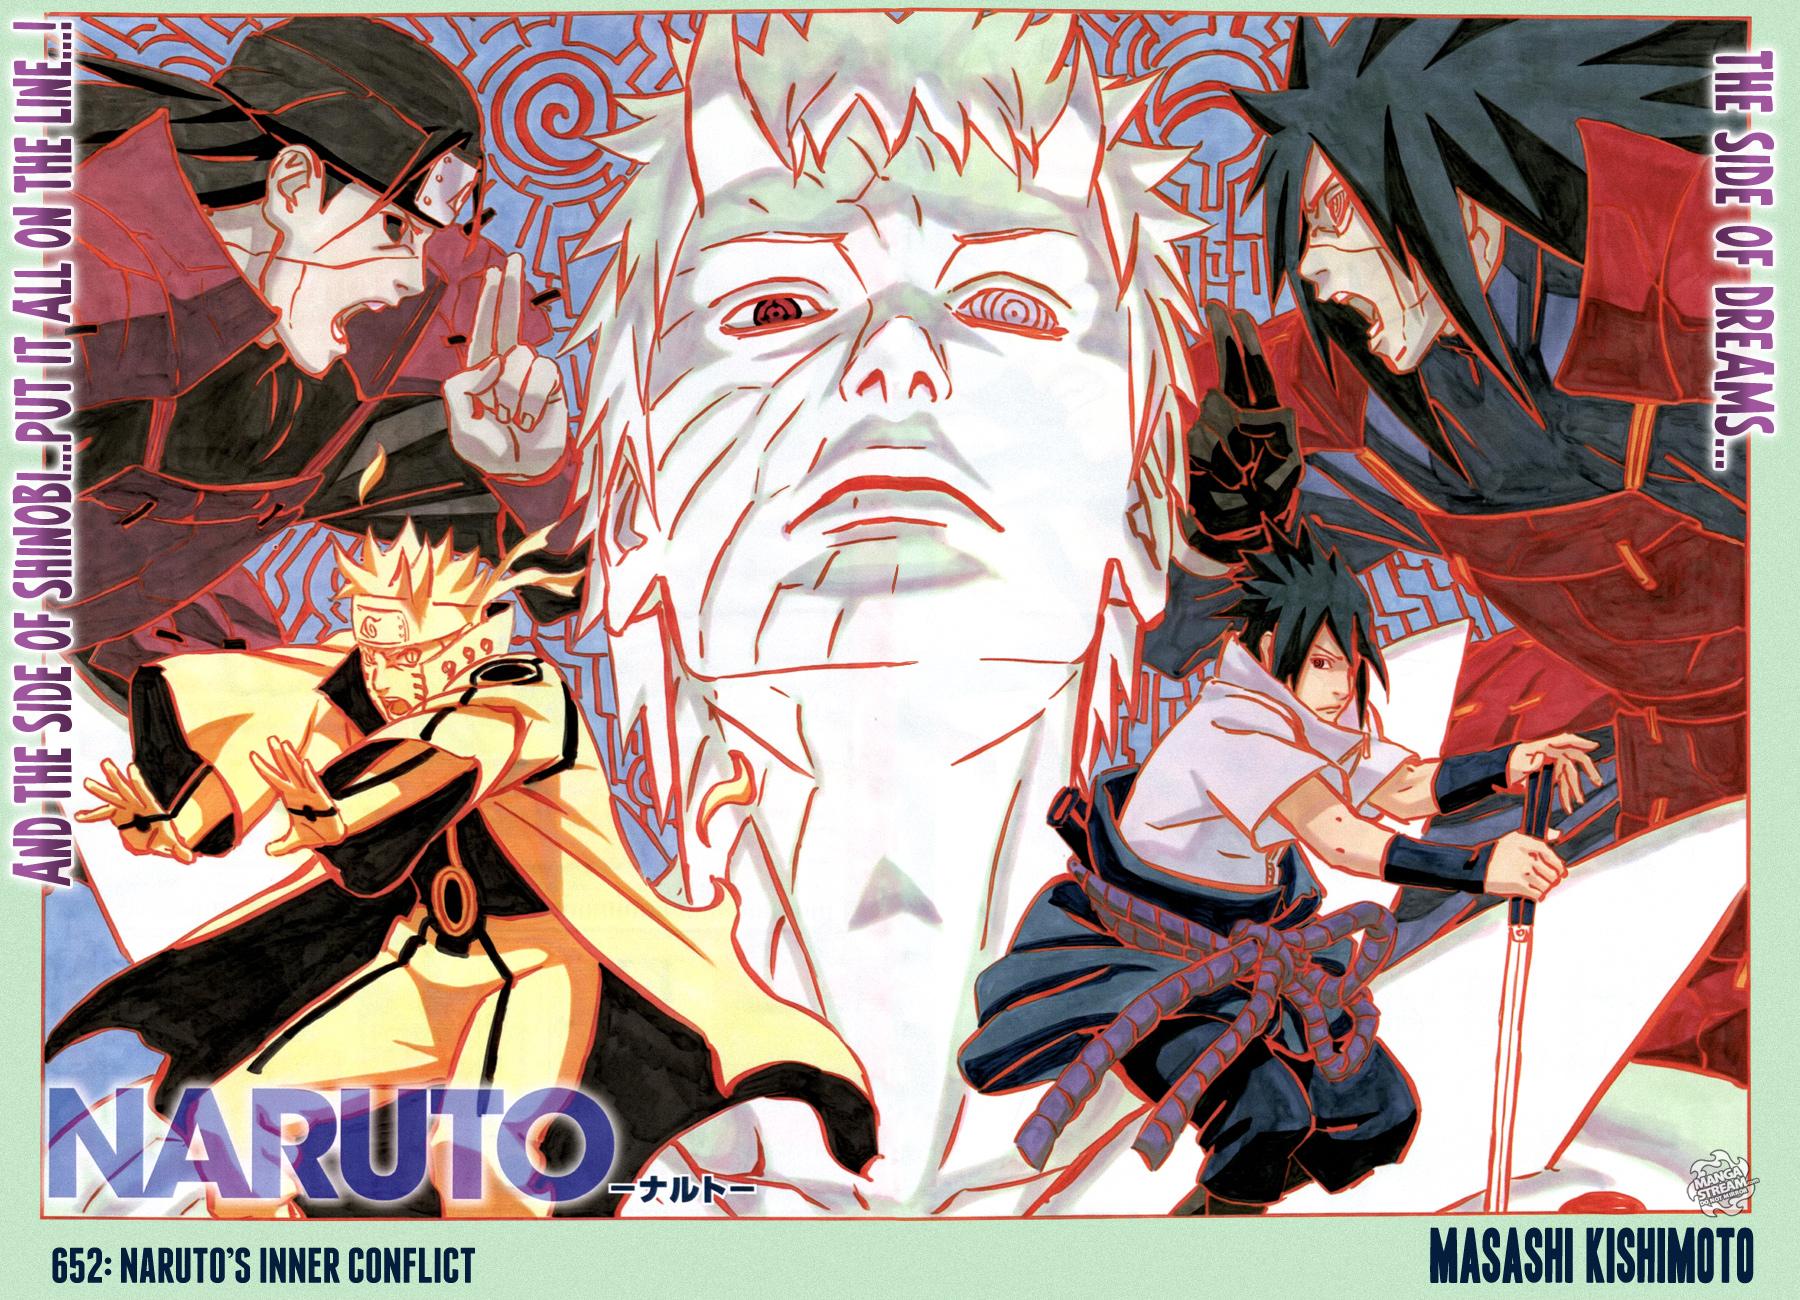 Naruto 652 Poster Inner Conflict Sasuke Obito Hashirama Madara Daily Anime Art